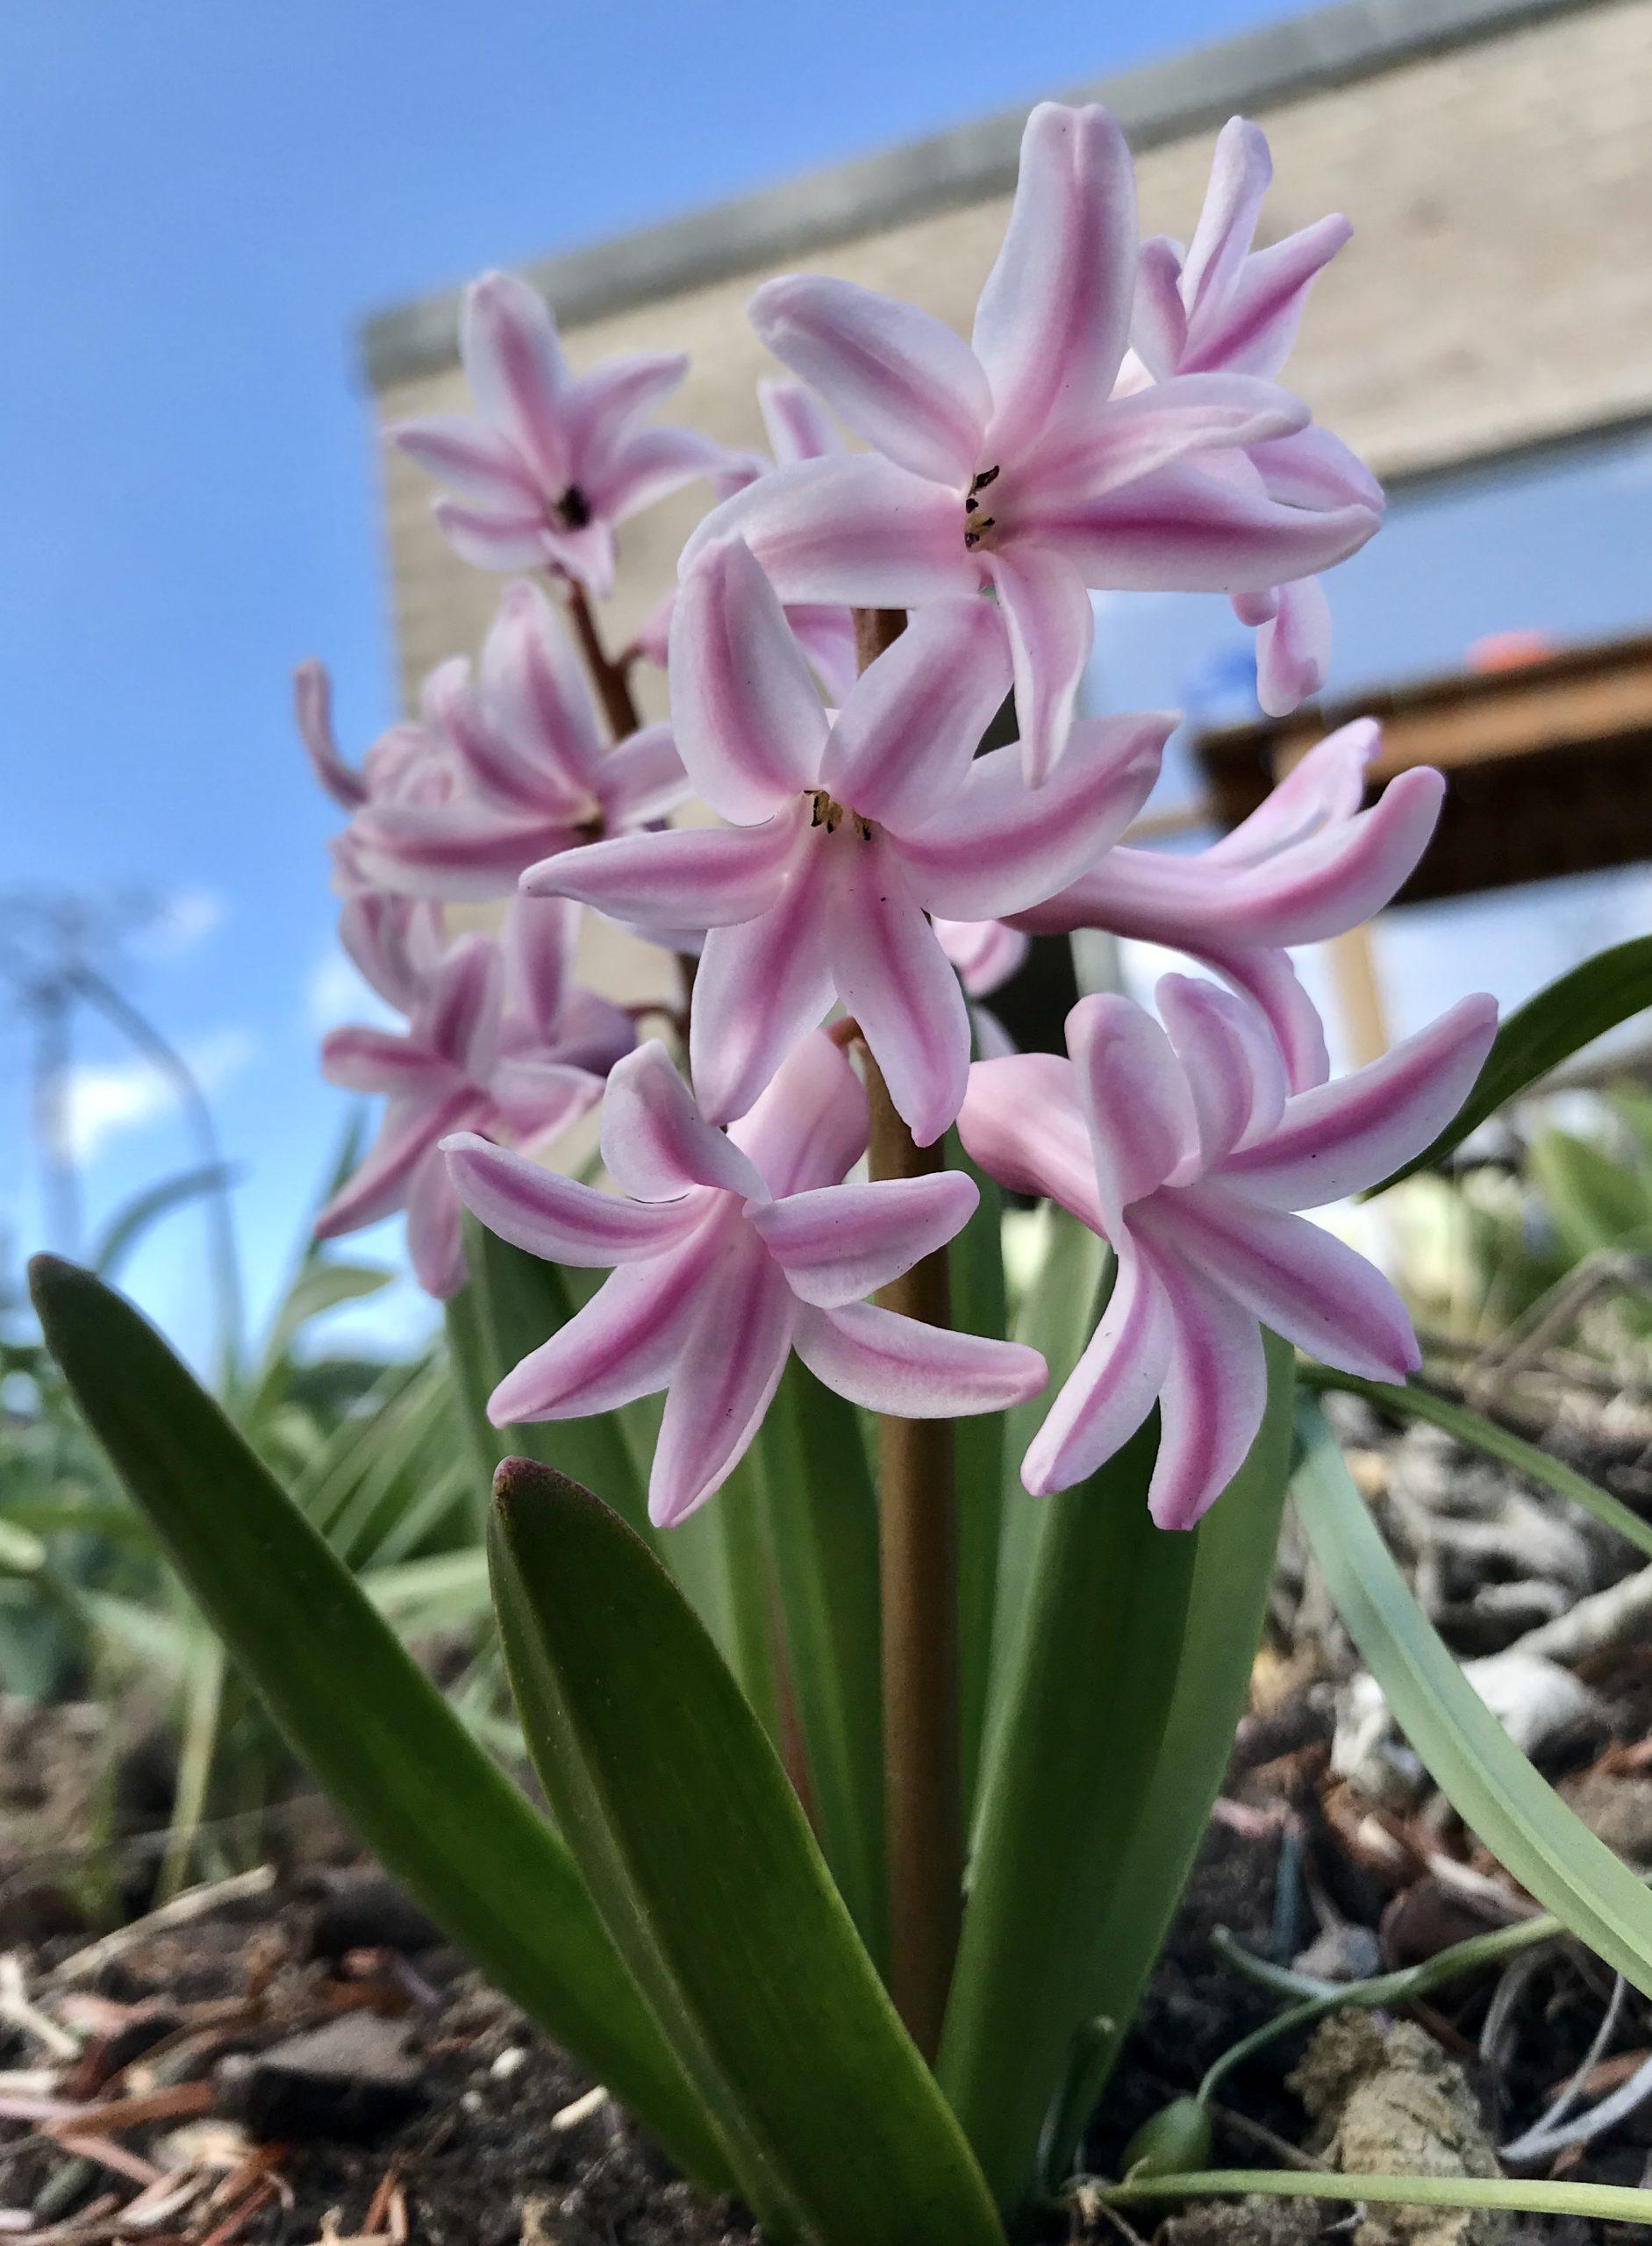 Ugens plante: Hyacint